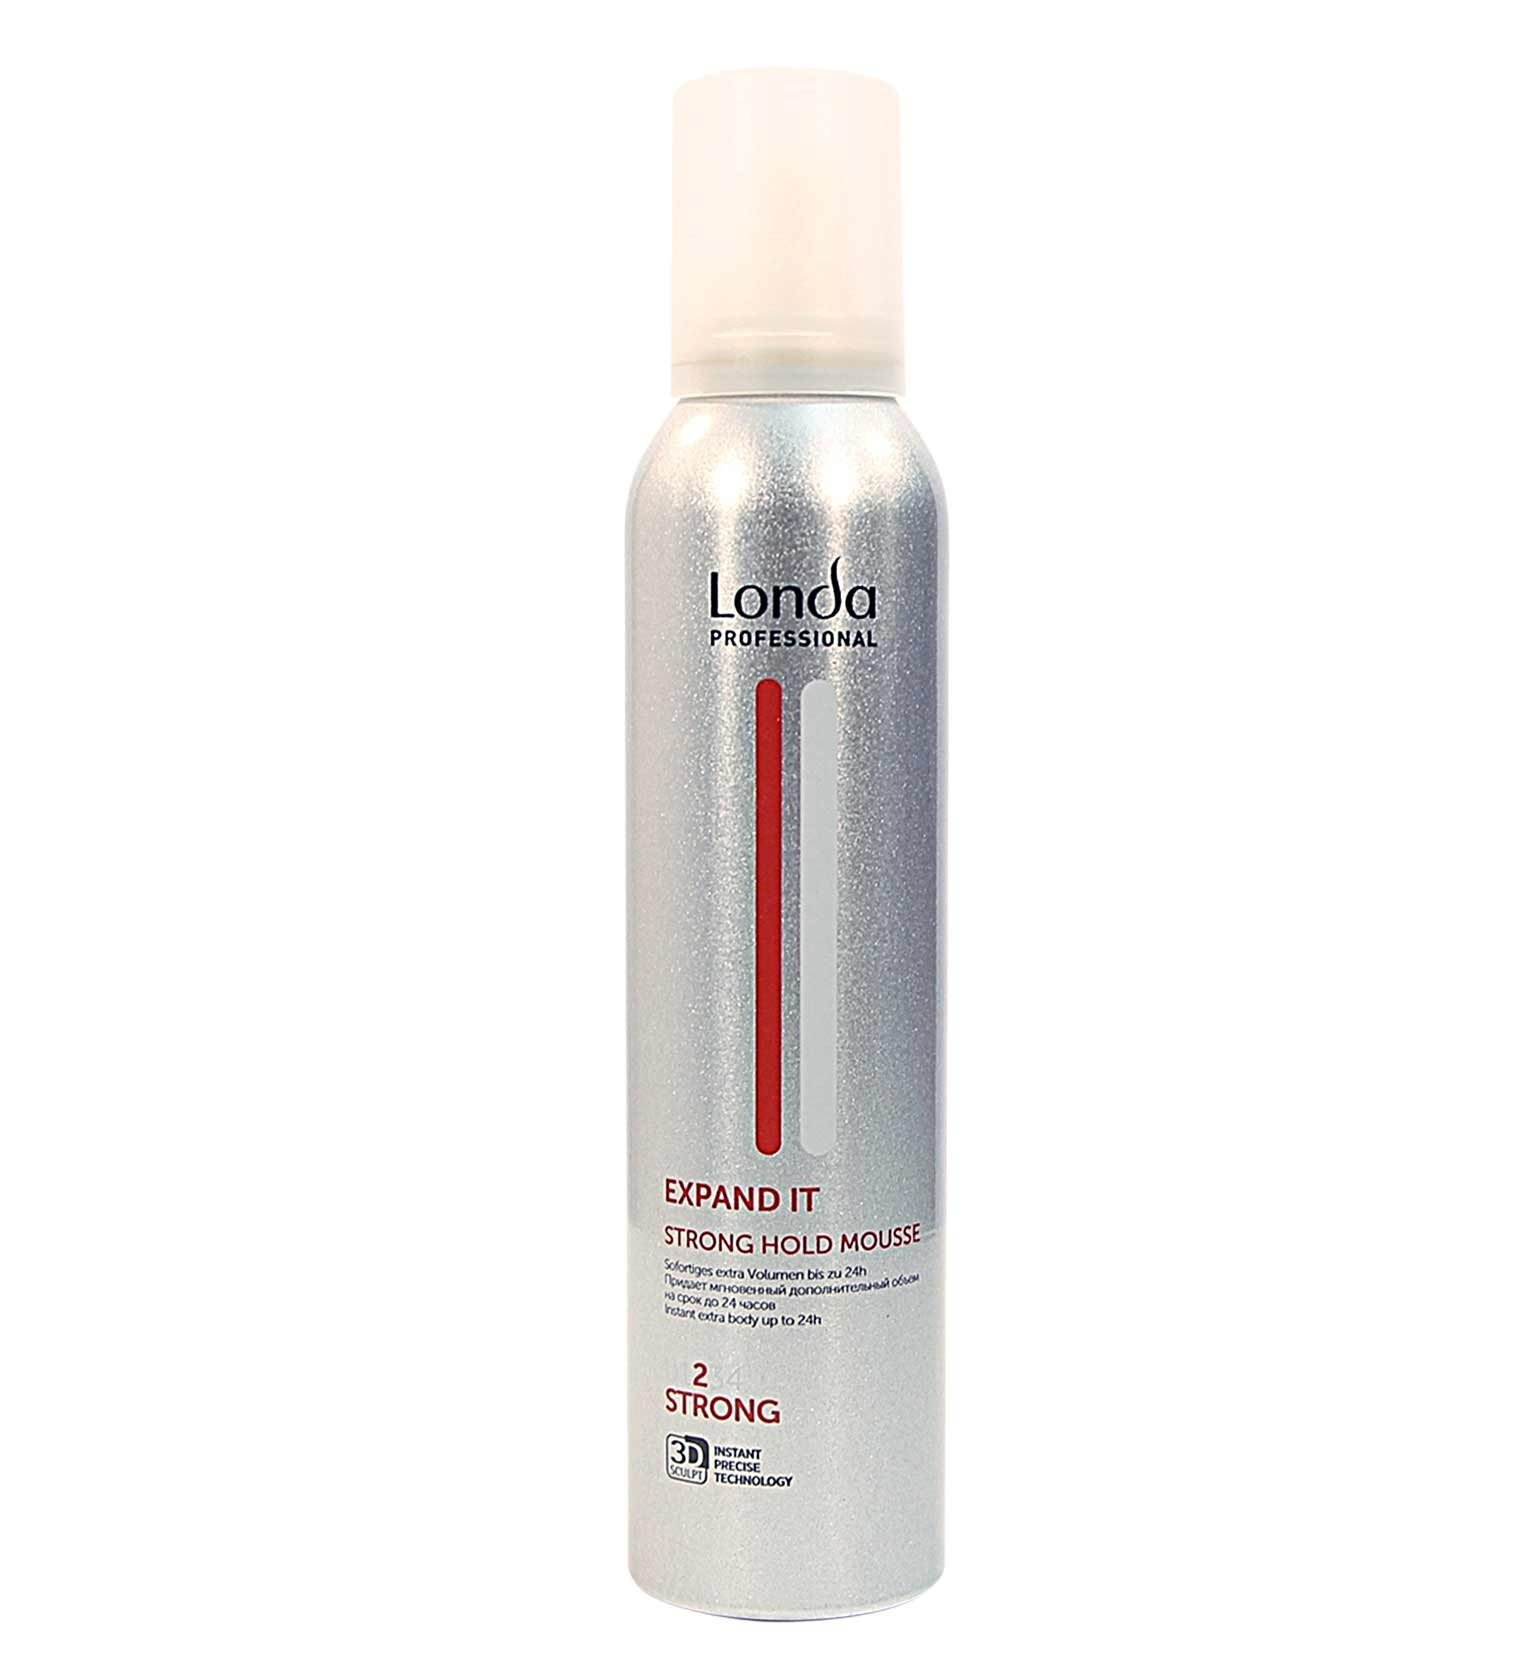 Londa Professional Пена для укладки волос сильной фиксации EXPAND IT 250 мл. Londa